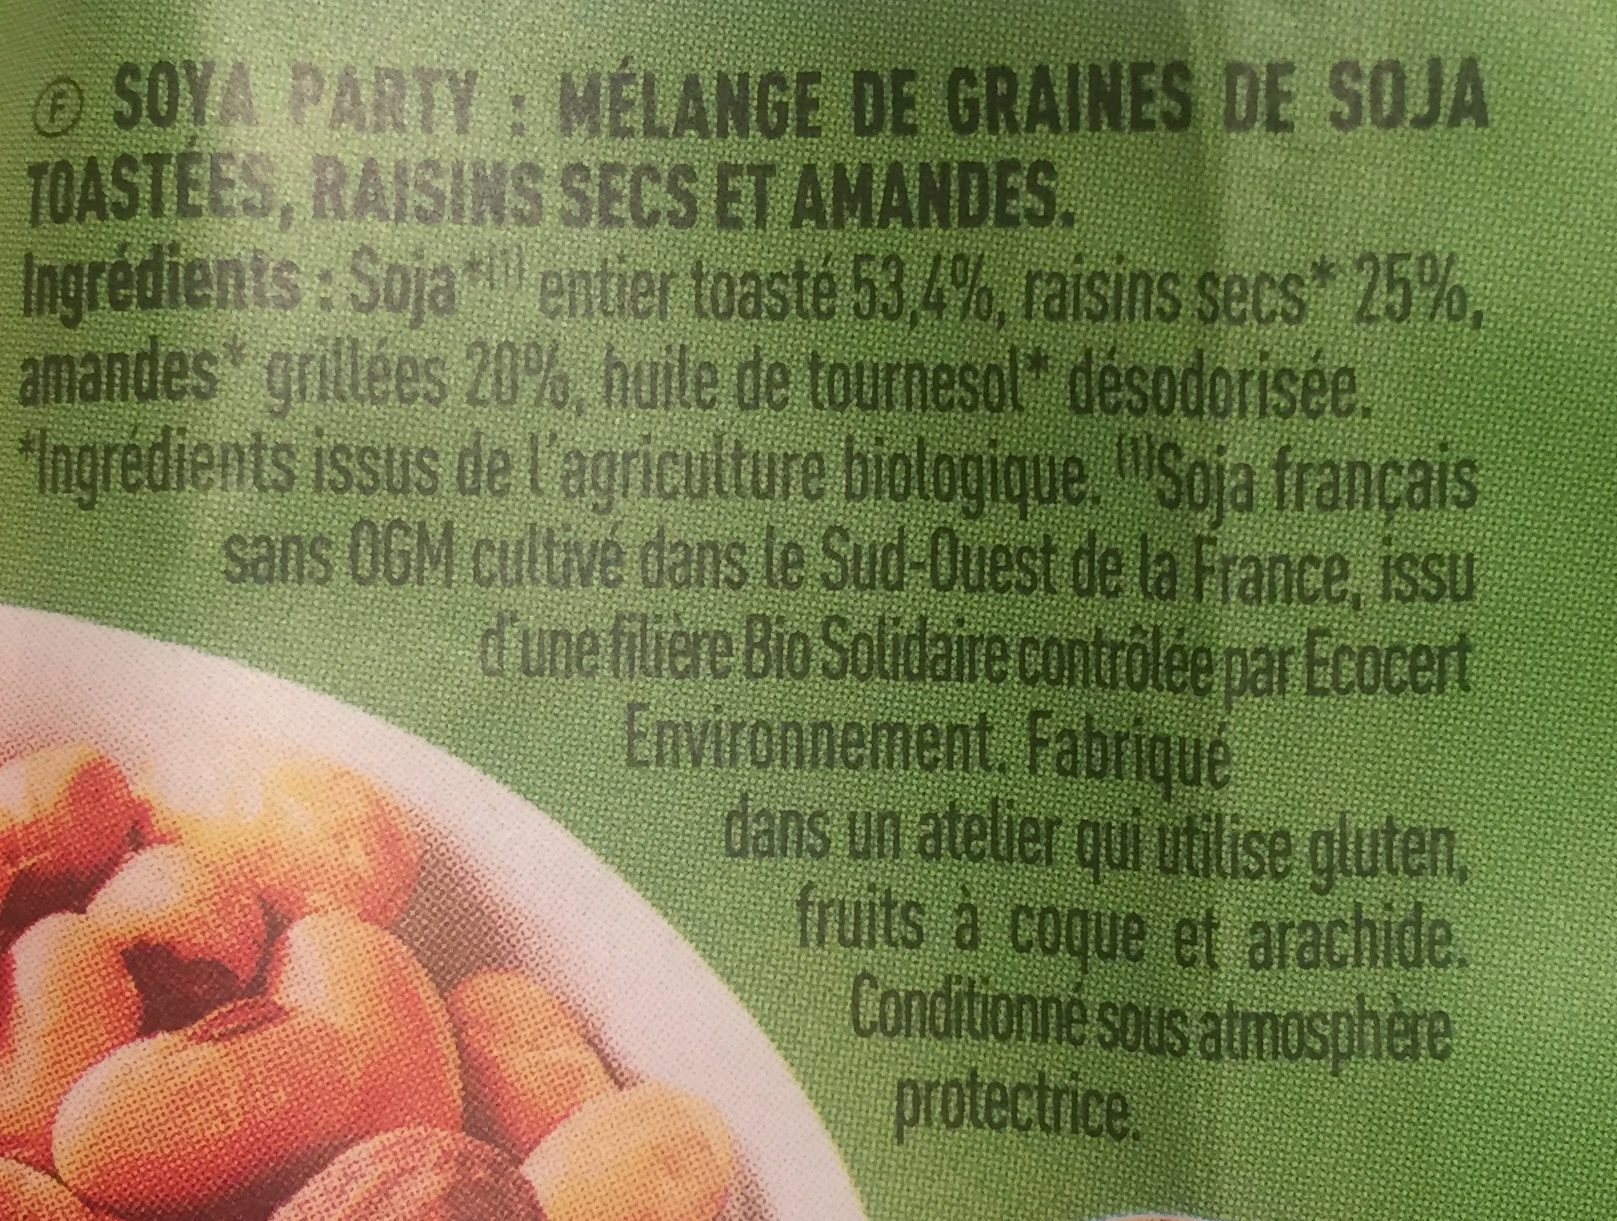 Graines De Soja Toastees Amandes Raisins Secs - Ingredients - fr